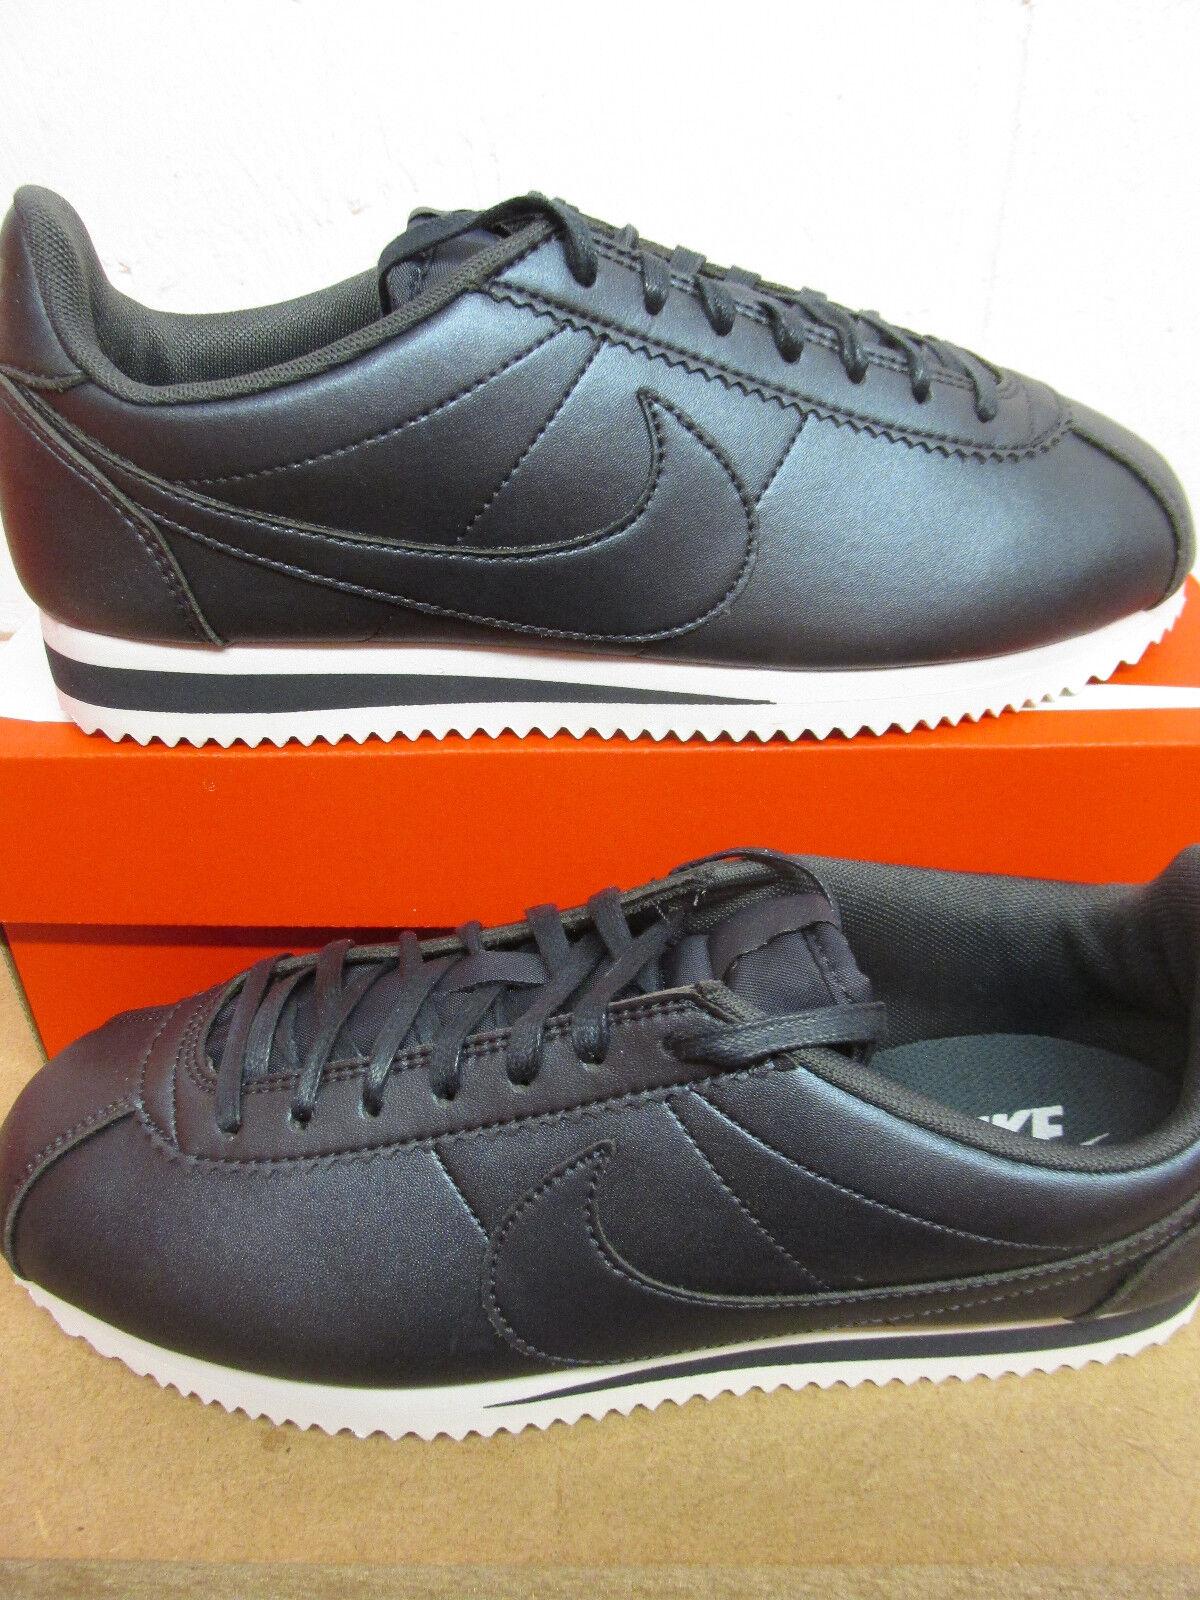 nike Damenss classic cortez Leder trainers 807471 004 sneakers schuhe